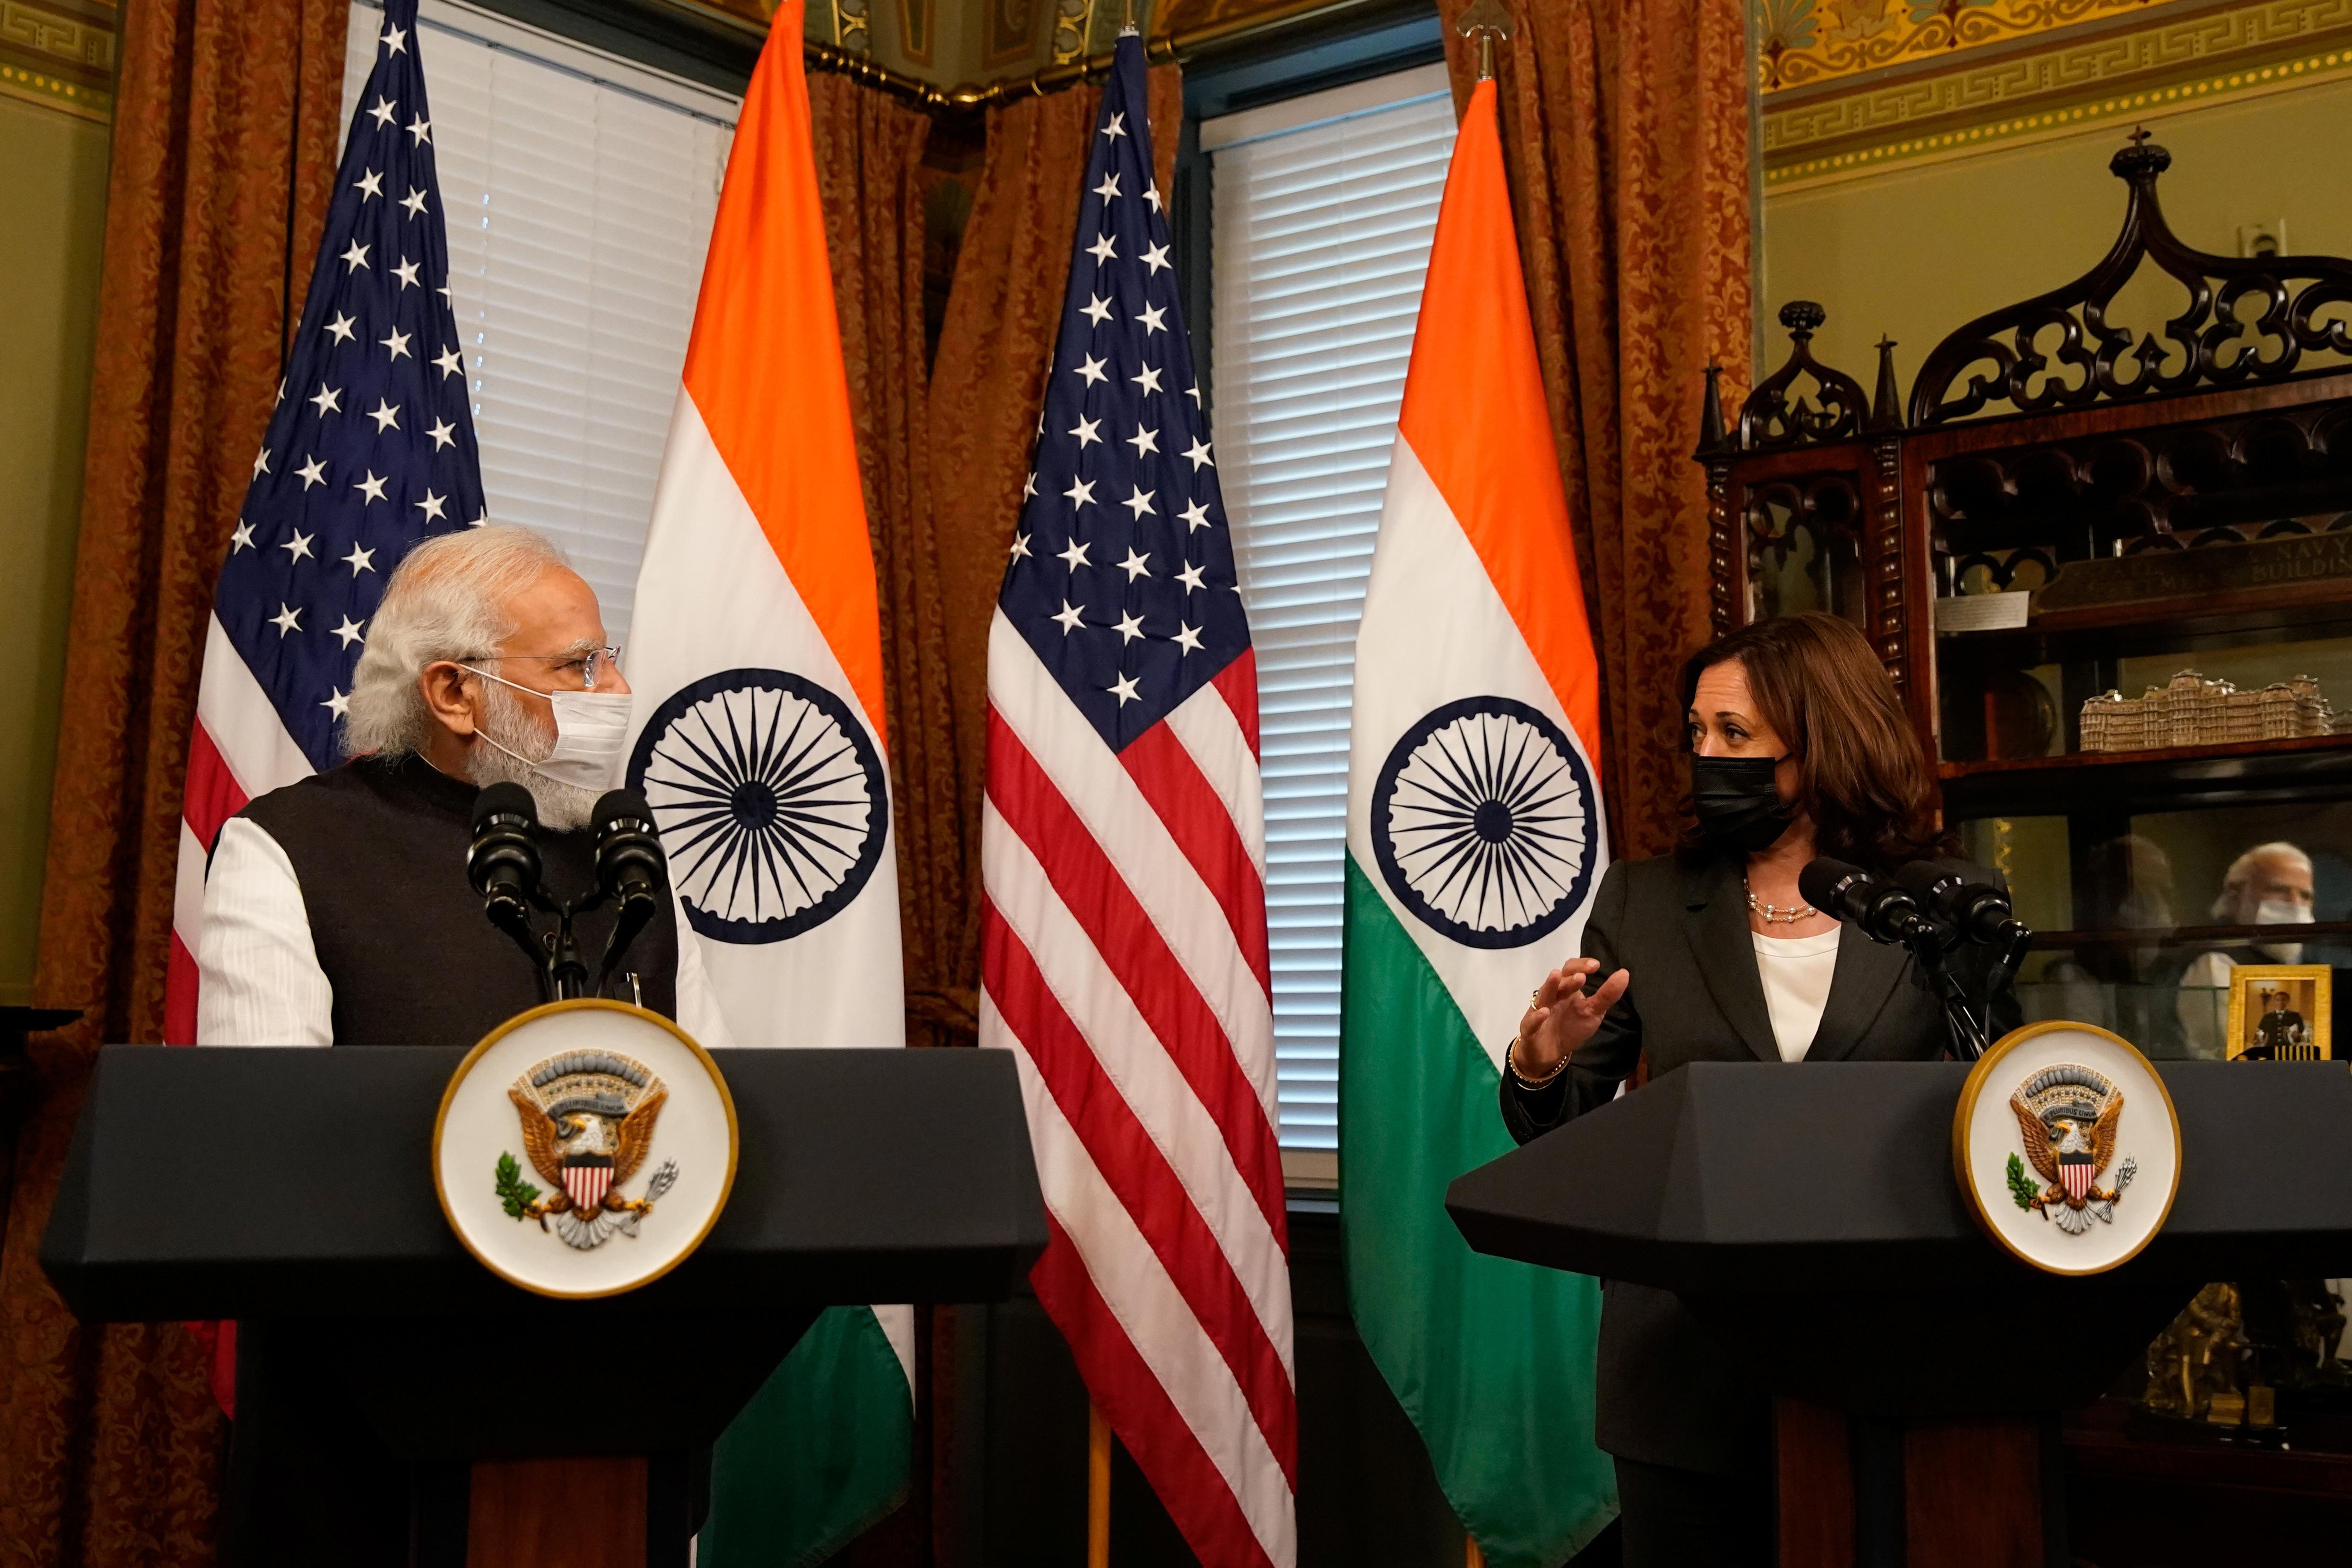 U.S. Vice President Kamala Harris delivers remarks beside Indian Prime Minister Narendra Modi inside the Eisenhower Executive Office Building at the White House in Washington, U.S., September 23, 2021. REUTERS/Elizabeth Frantz